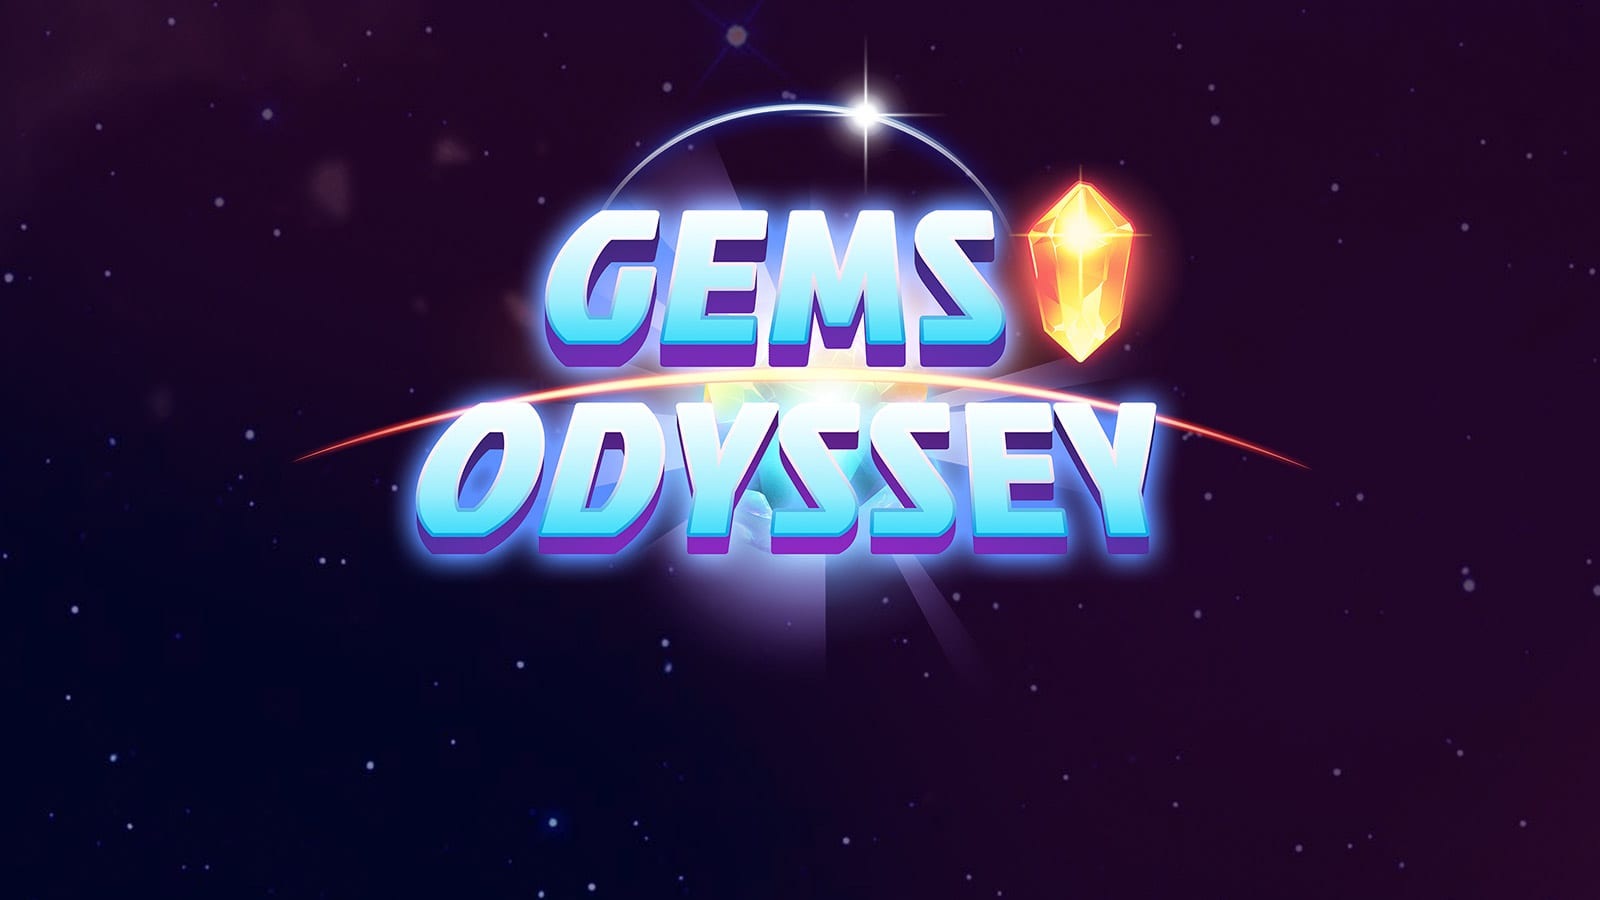 Gems Odyssey online slots game logo